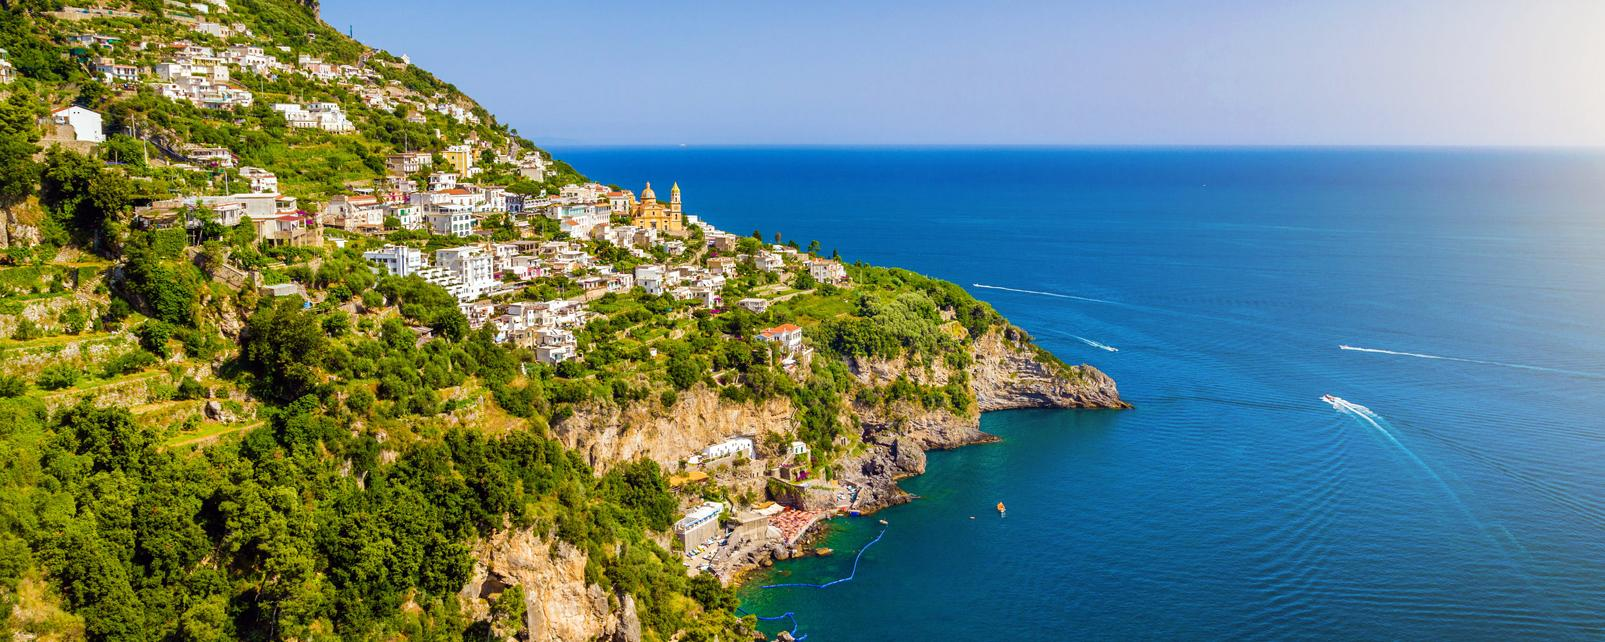 Europe, Italie, Campanie, côte, amalfitaine, Salerne, ville, maison, église, mer, arbre, bateau,